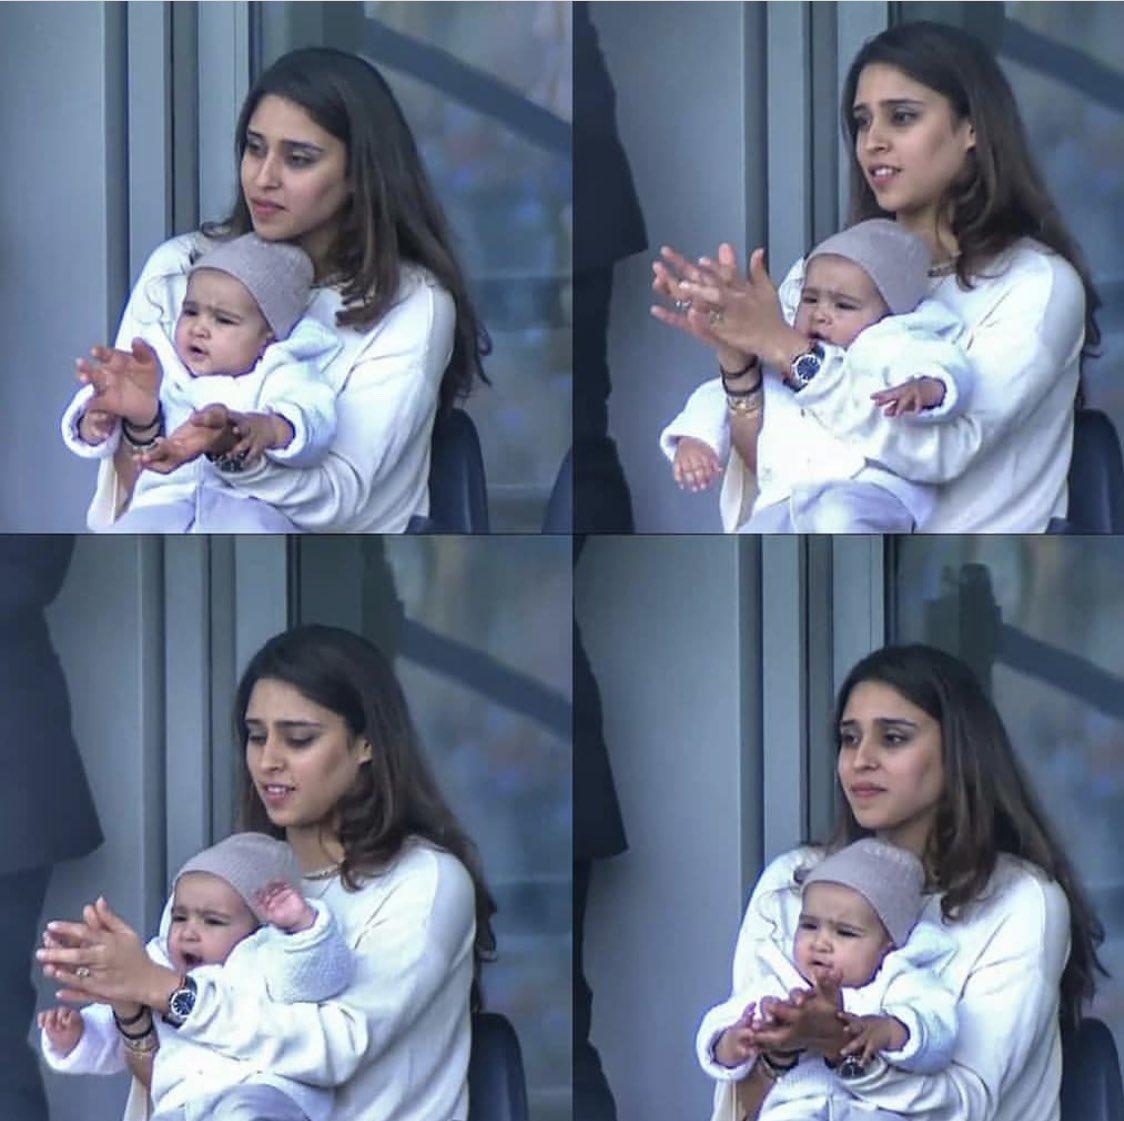 World Cup 2019: मैदान पर रितिका और बेटी समायरा को देख भावुक हुए रोहित शर्मा, ट्वीट कर कही दिल छु जाने वाली बात 1